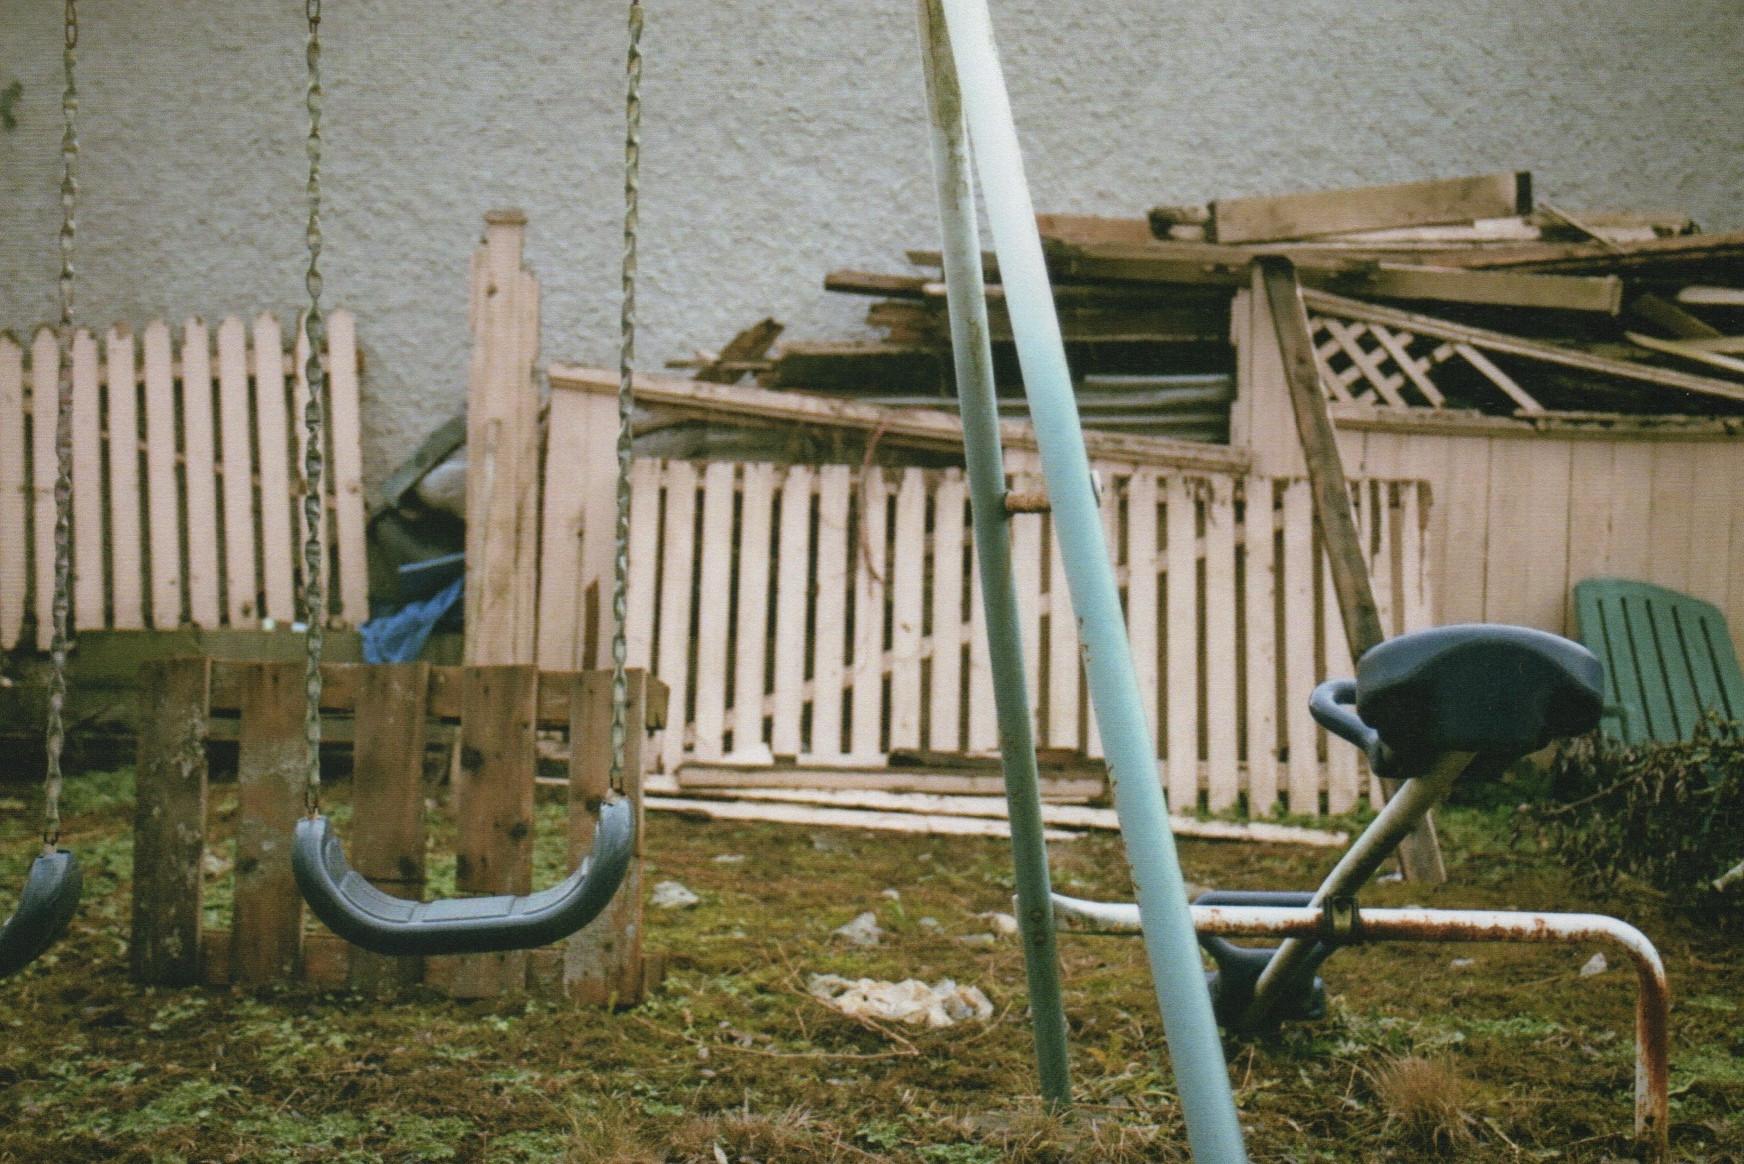 Abandoned Play